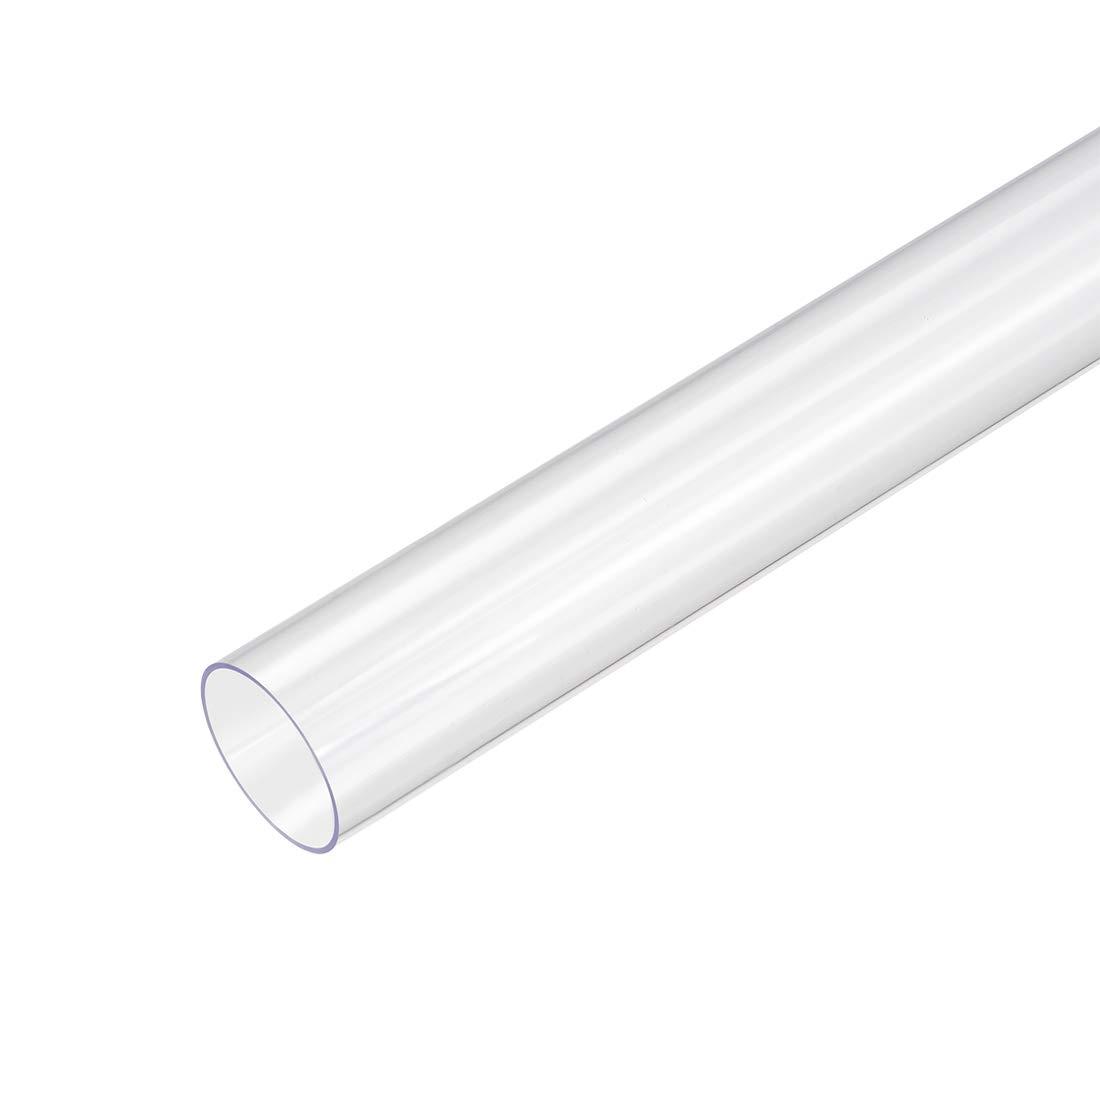 1//2-inch OD x 1.6ft uxcell 2pcs PVC Rigid Round Clear Tubing